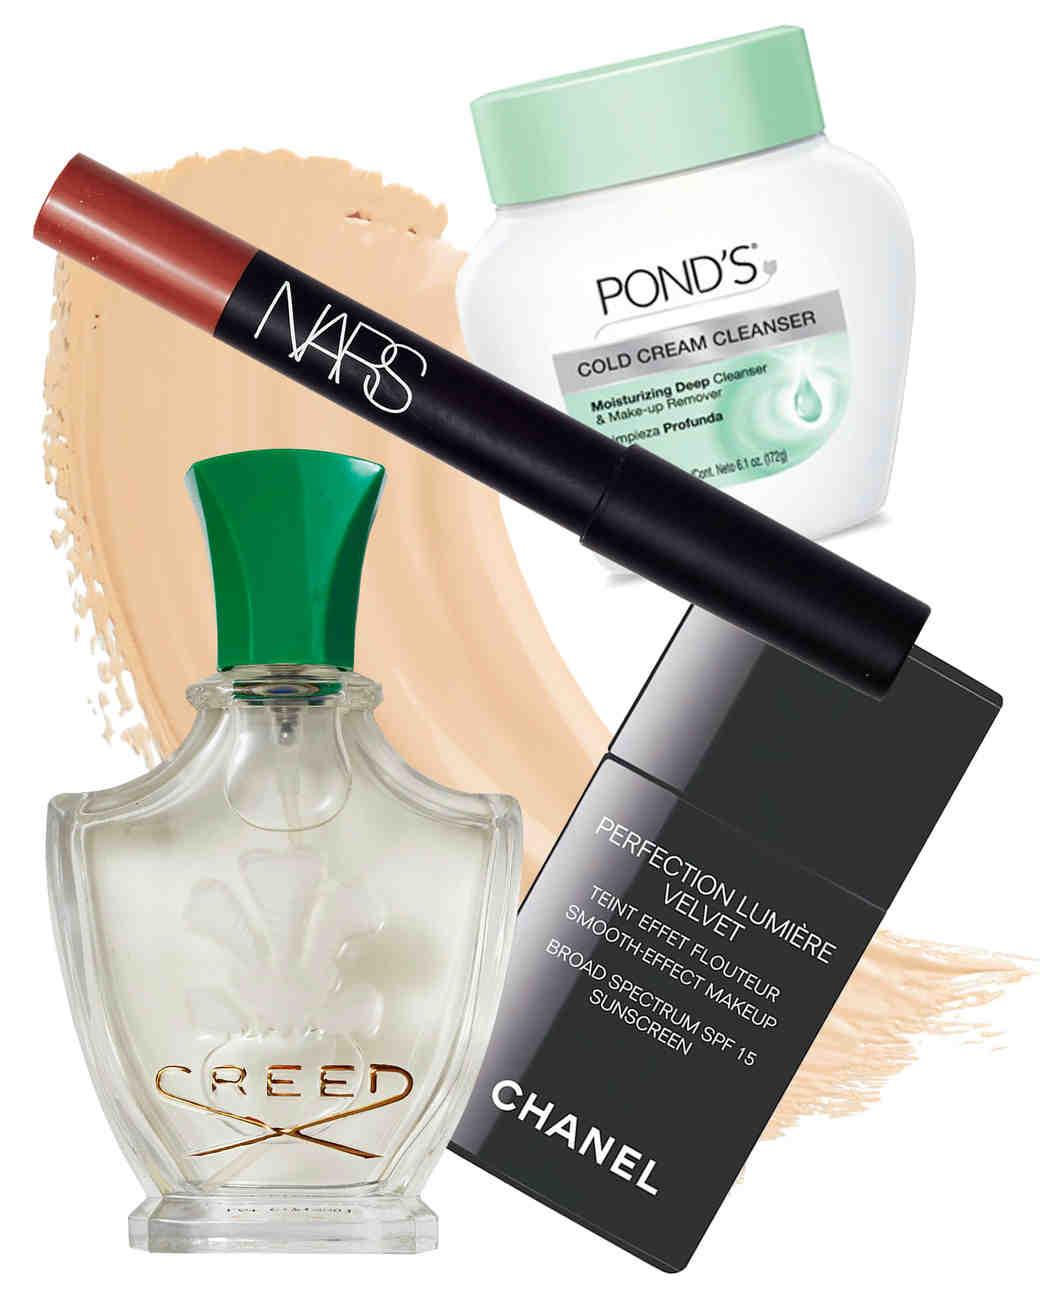 aisle-icon-beauty-products-grace-kelly-0115.jpg